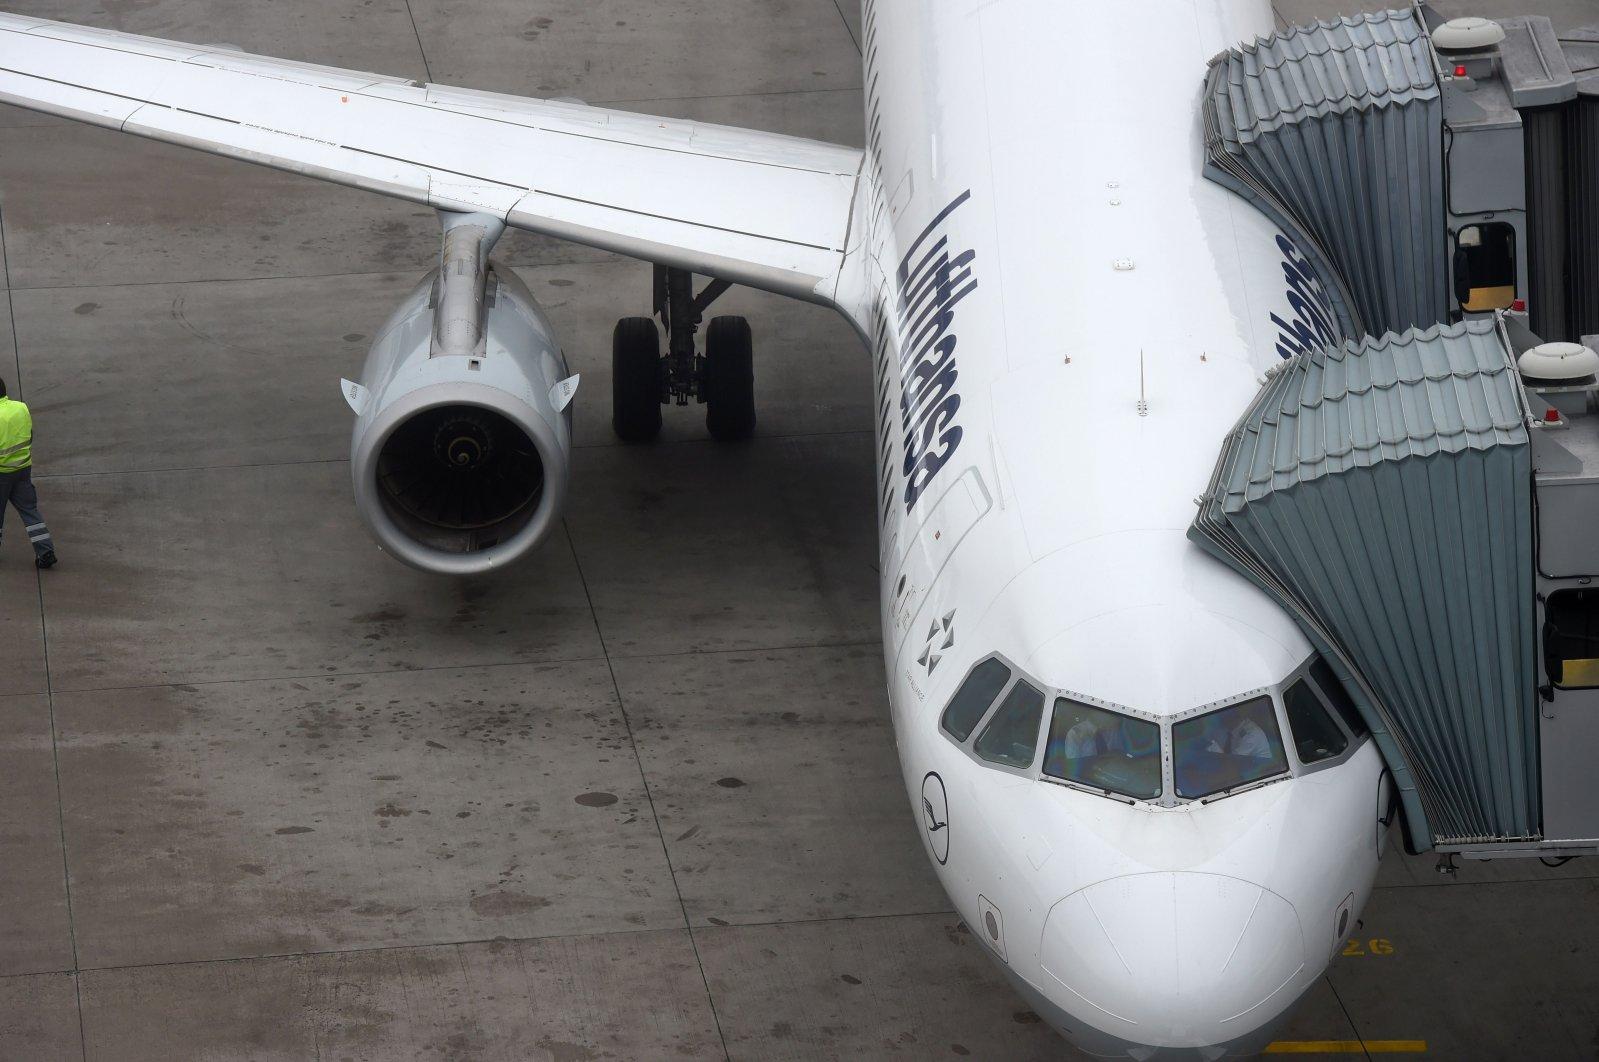 An employee at the Franz-Josef-Strauss airport walks past a plane belonging to German airline Lufthansa, Nov. 24, 2016, Munich. (AFP Photo)